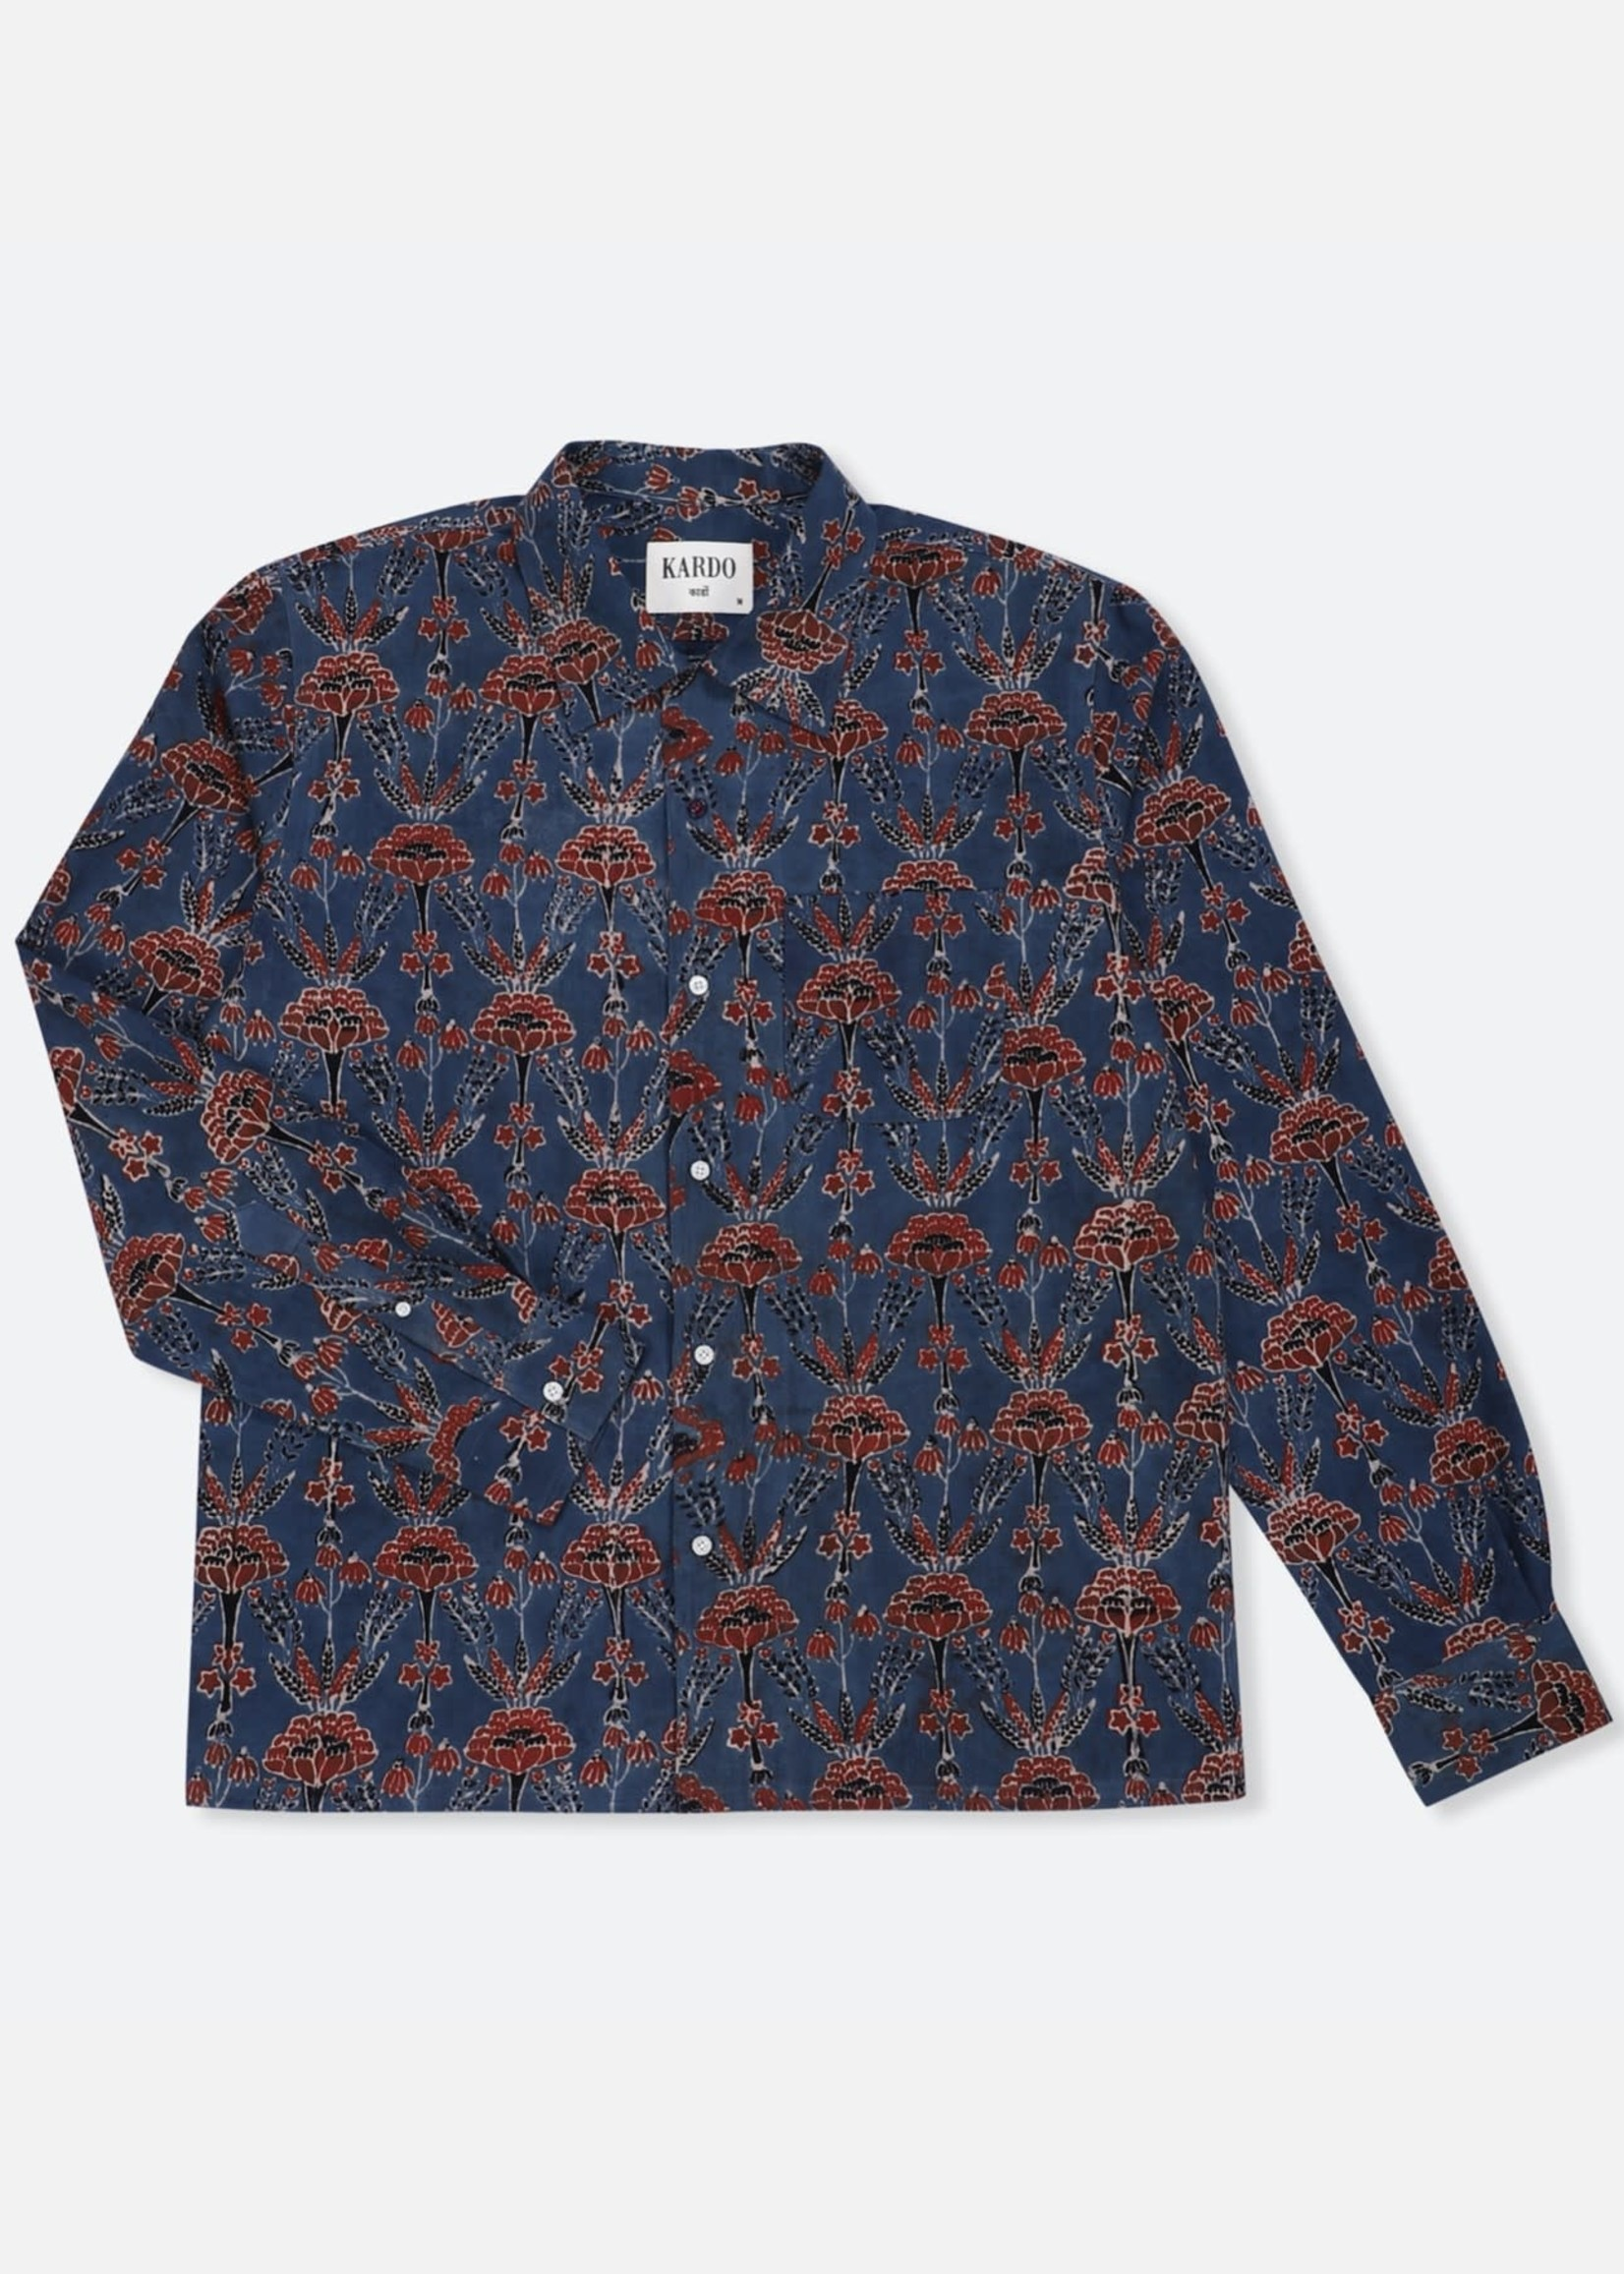 Kardo Kardo Chintan Blue L/S Shirt